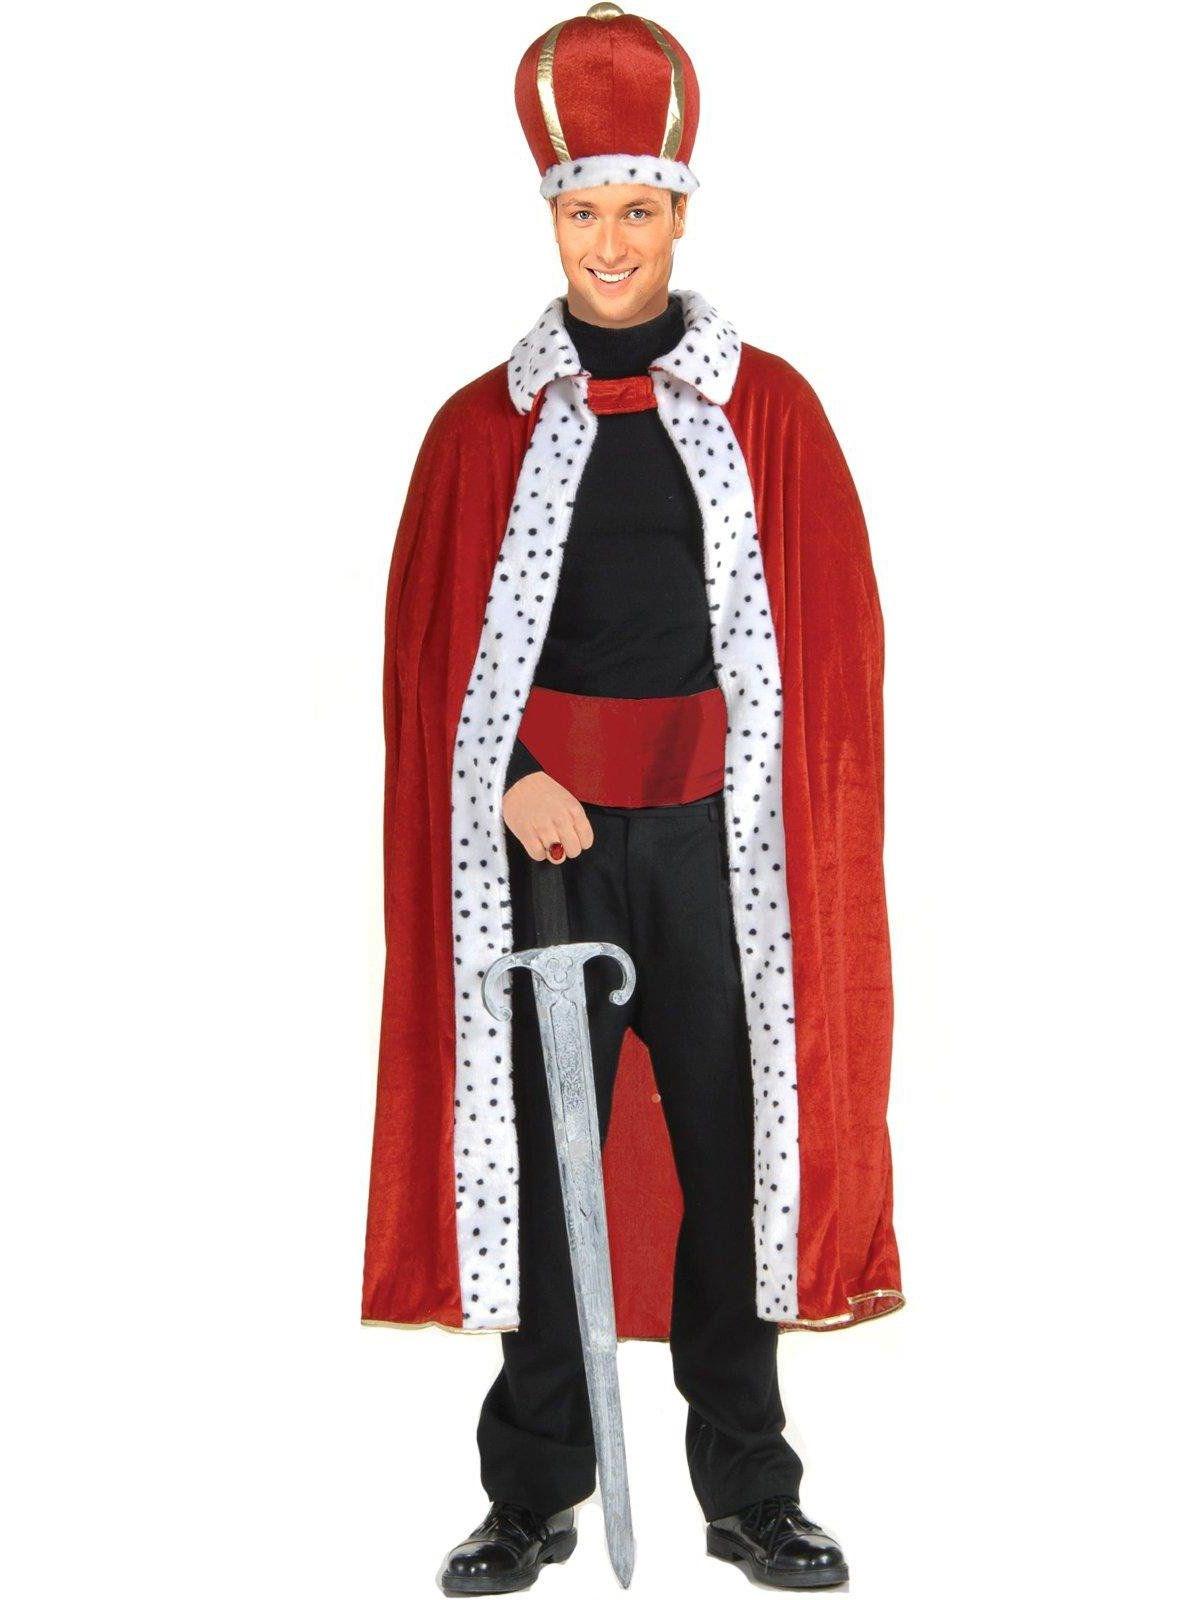 Image of King Robe Crown Adult Costume Kit